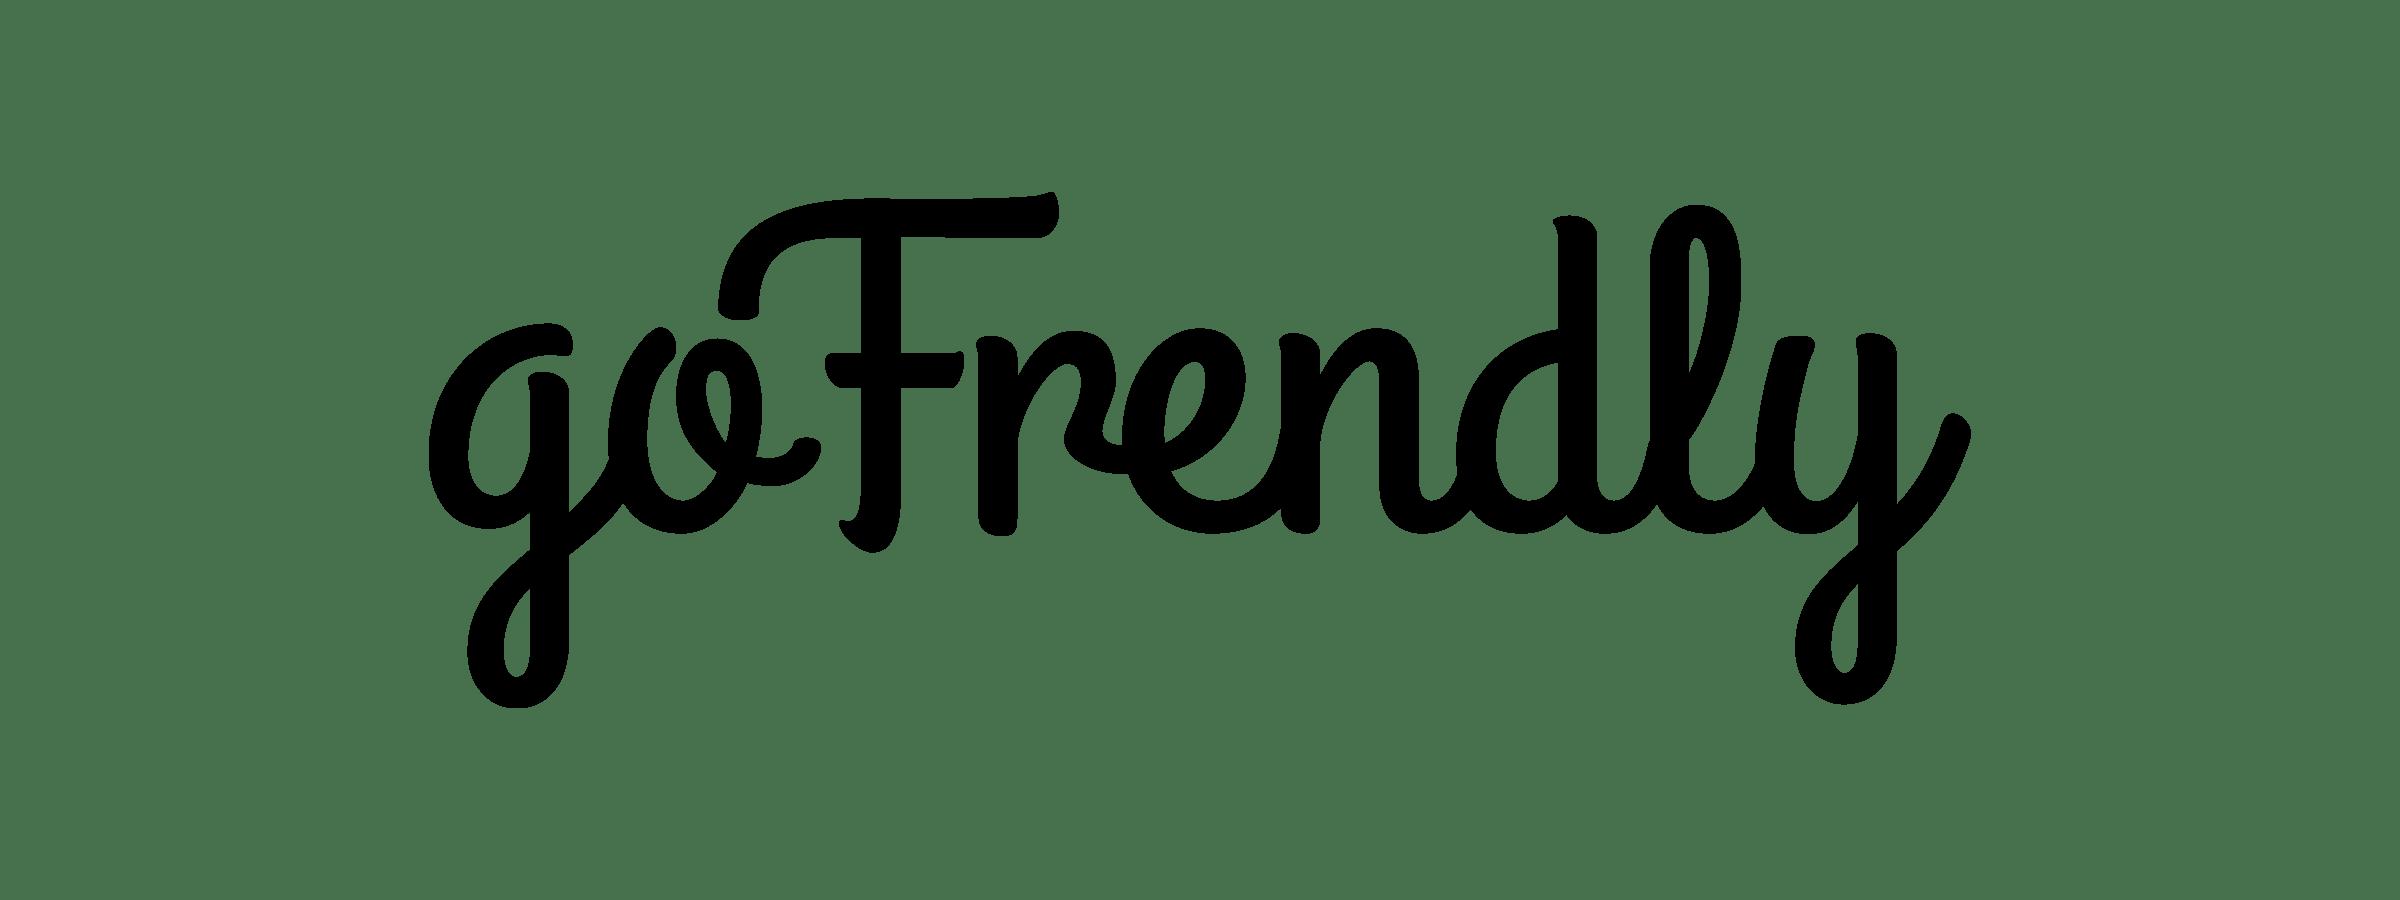 GoFrendly company logo